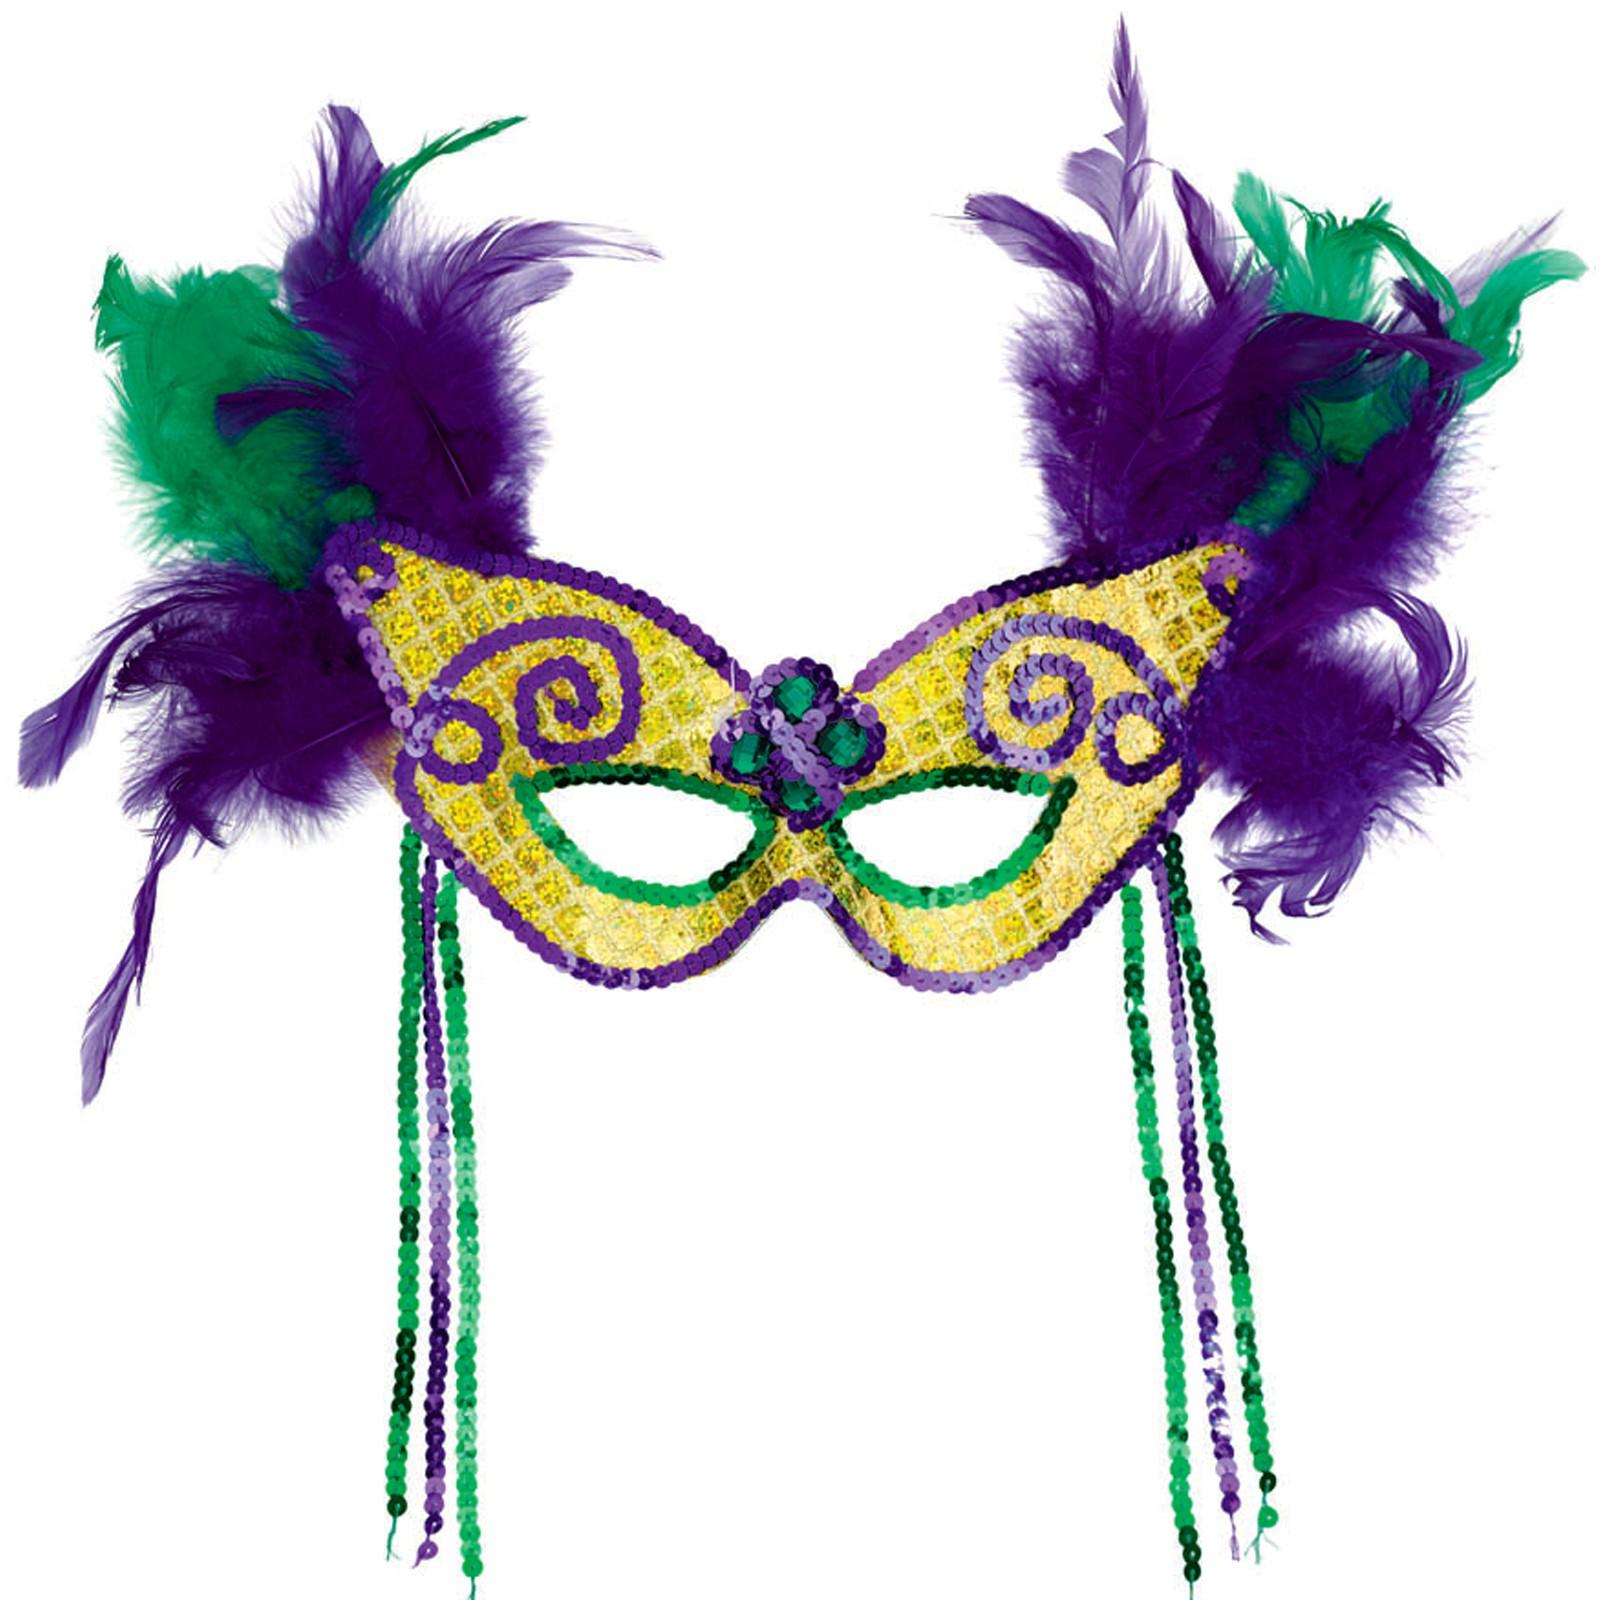 Mardi Gras Carnival Masks 2013 – Latest & Beautiful Masks ...